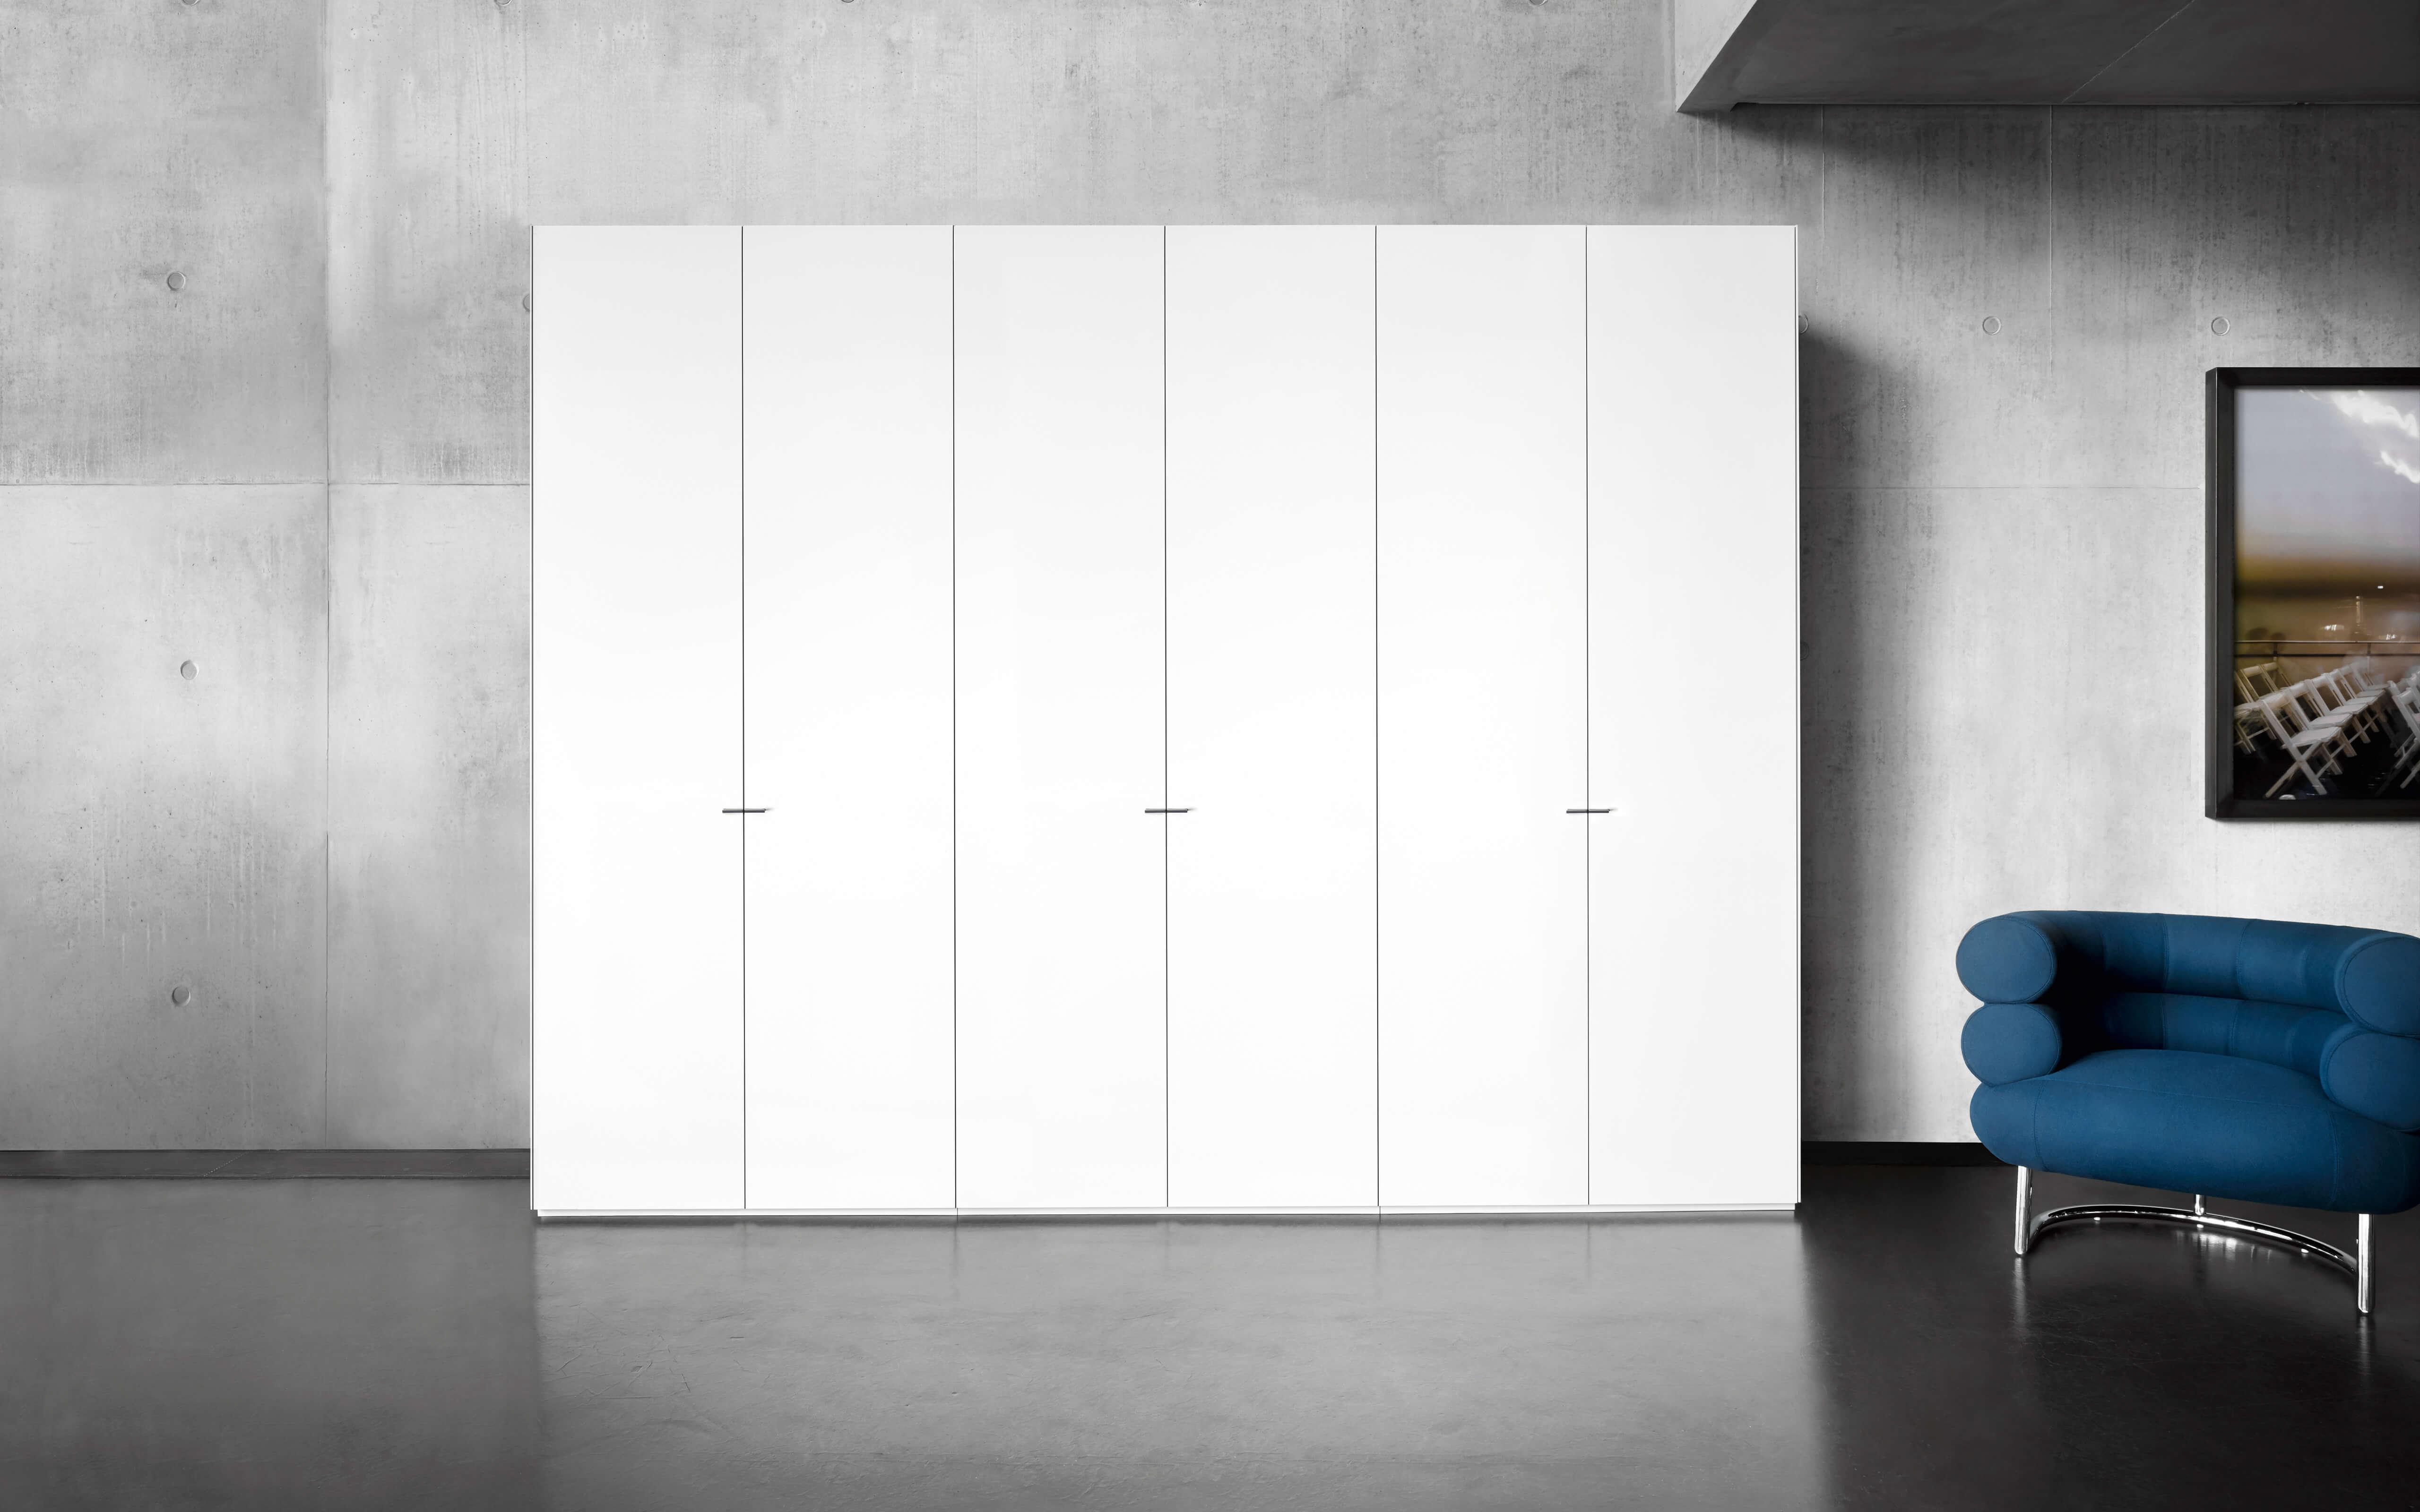 schrank de awesome holz mit schiebetren with schrank de. Black Bedroom Furniture Sets. Home Design Ideas